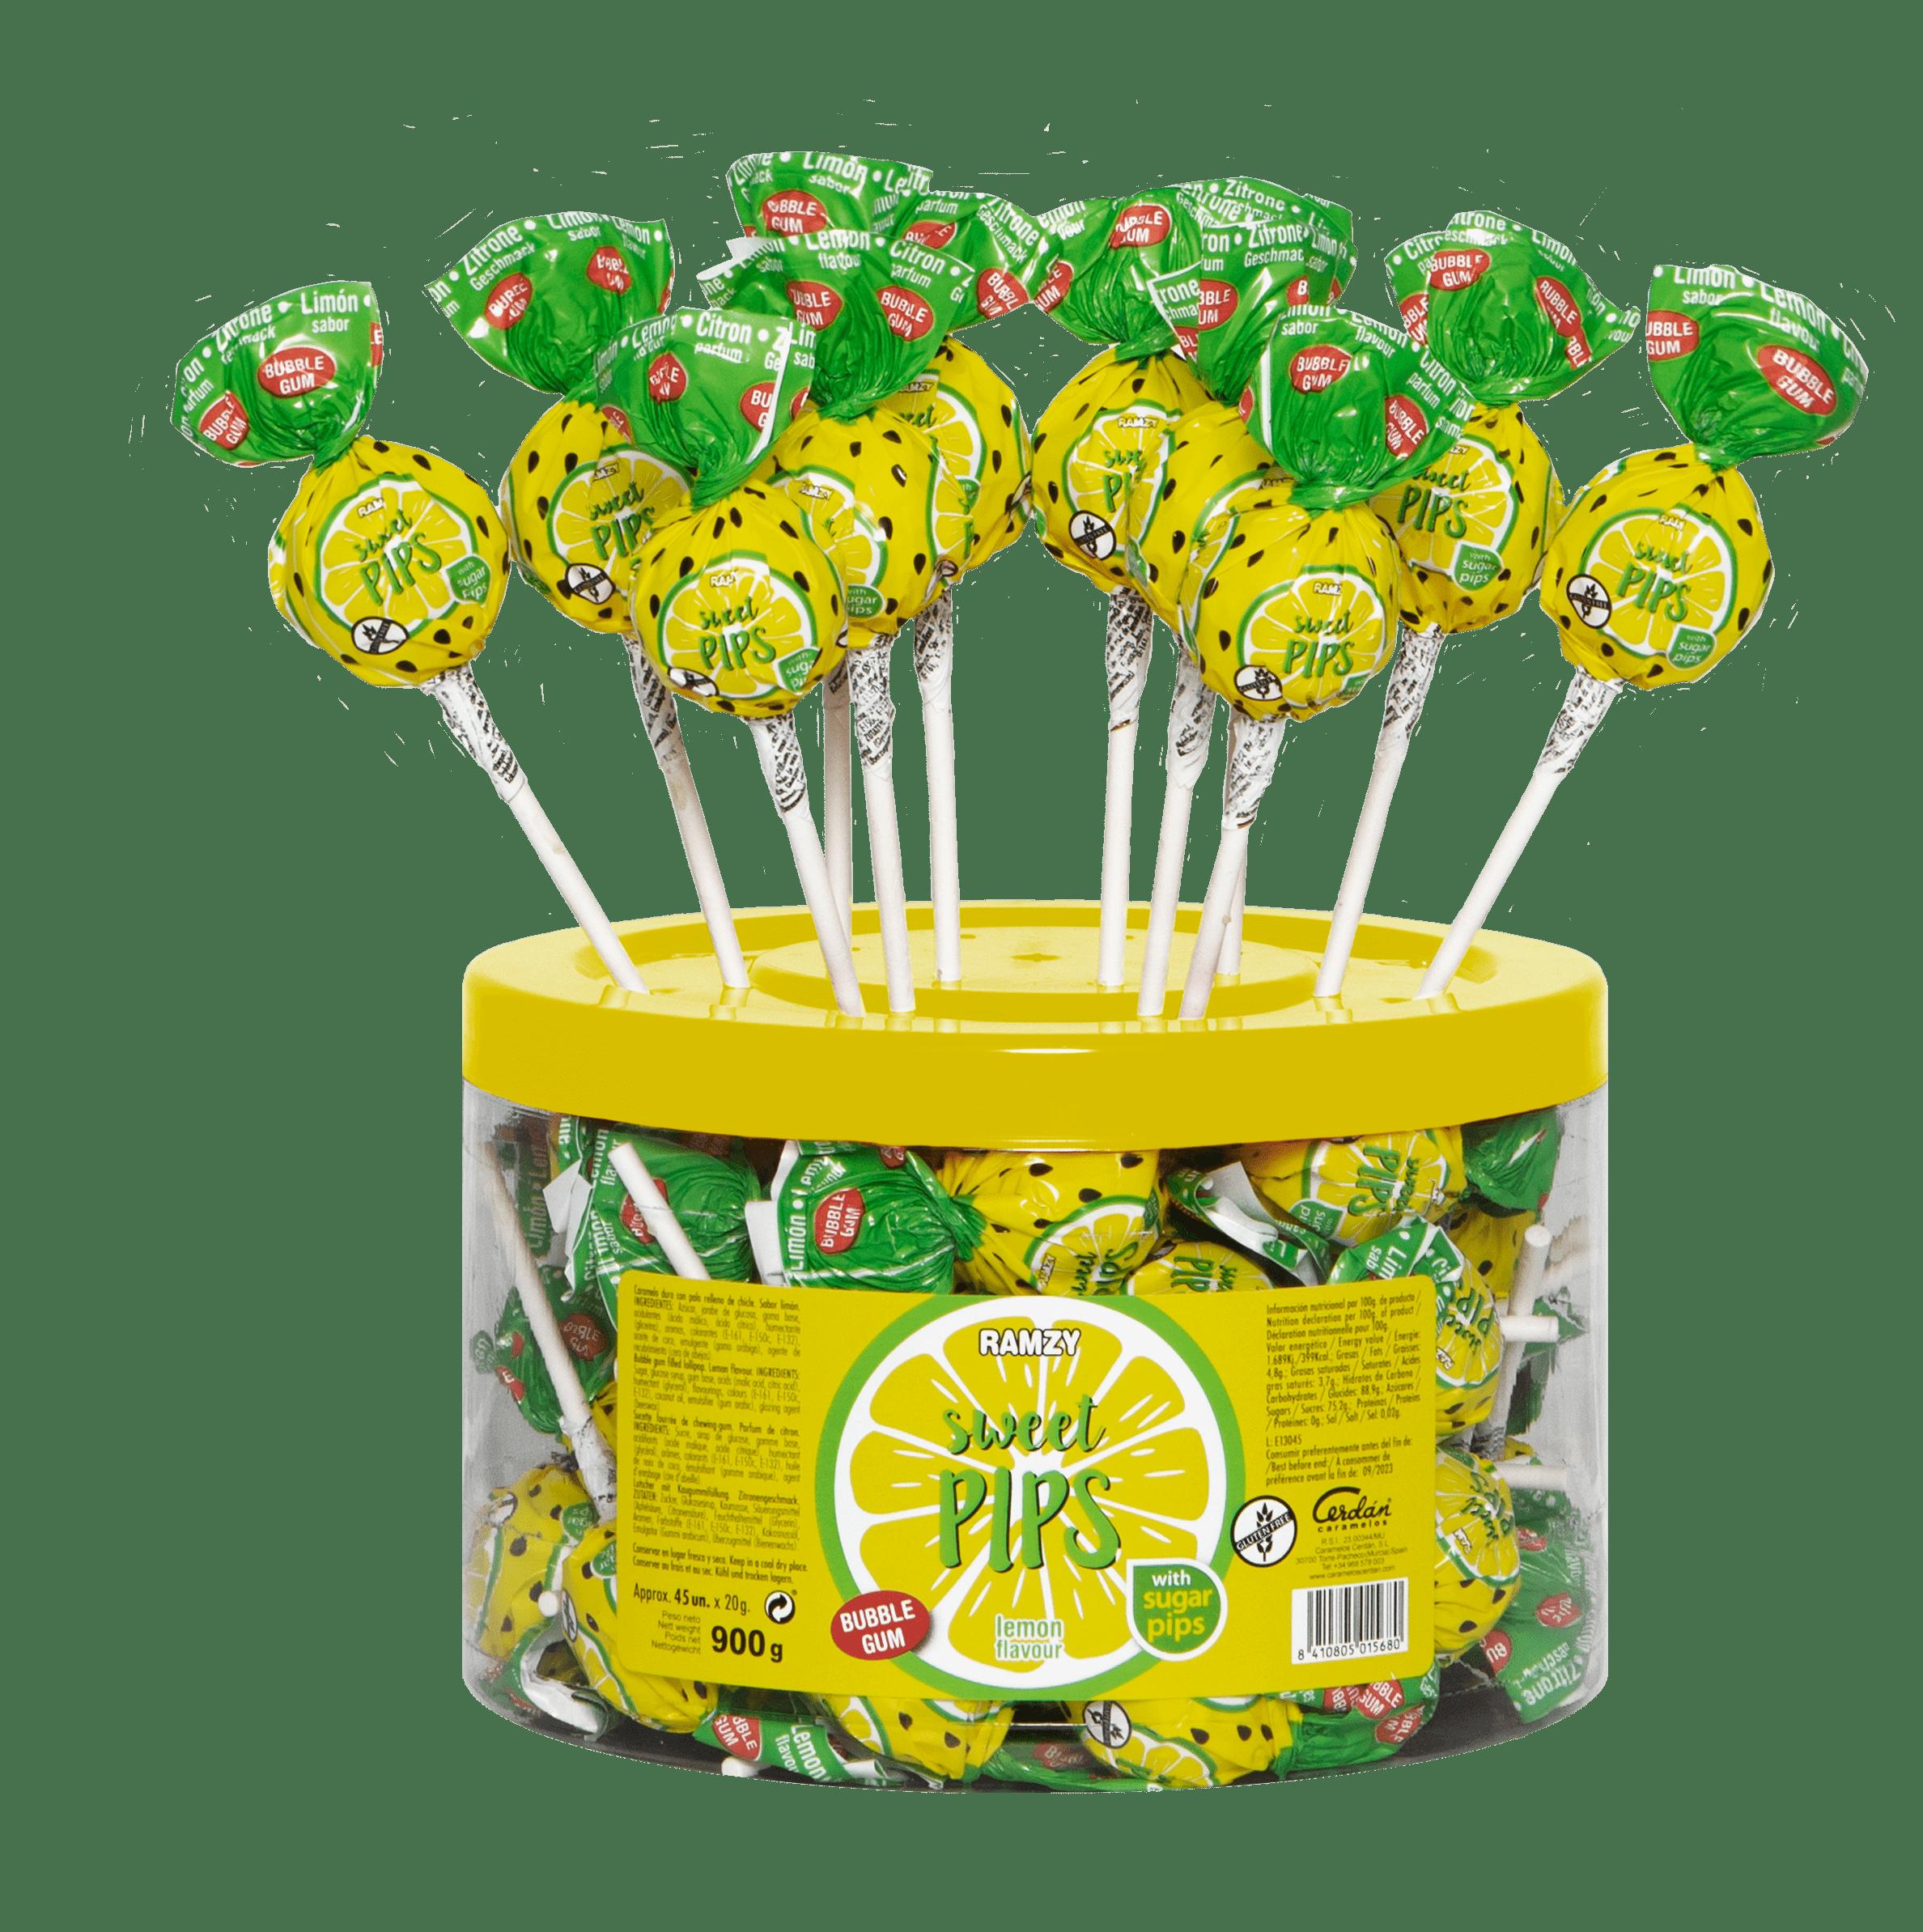 mega-sweet-pips-expositor-bajo-limon